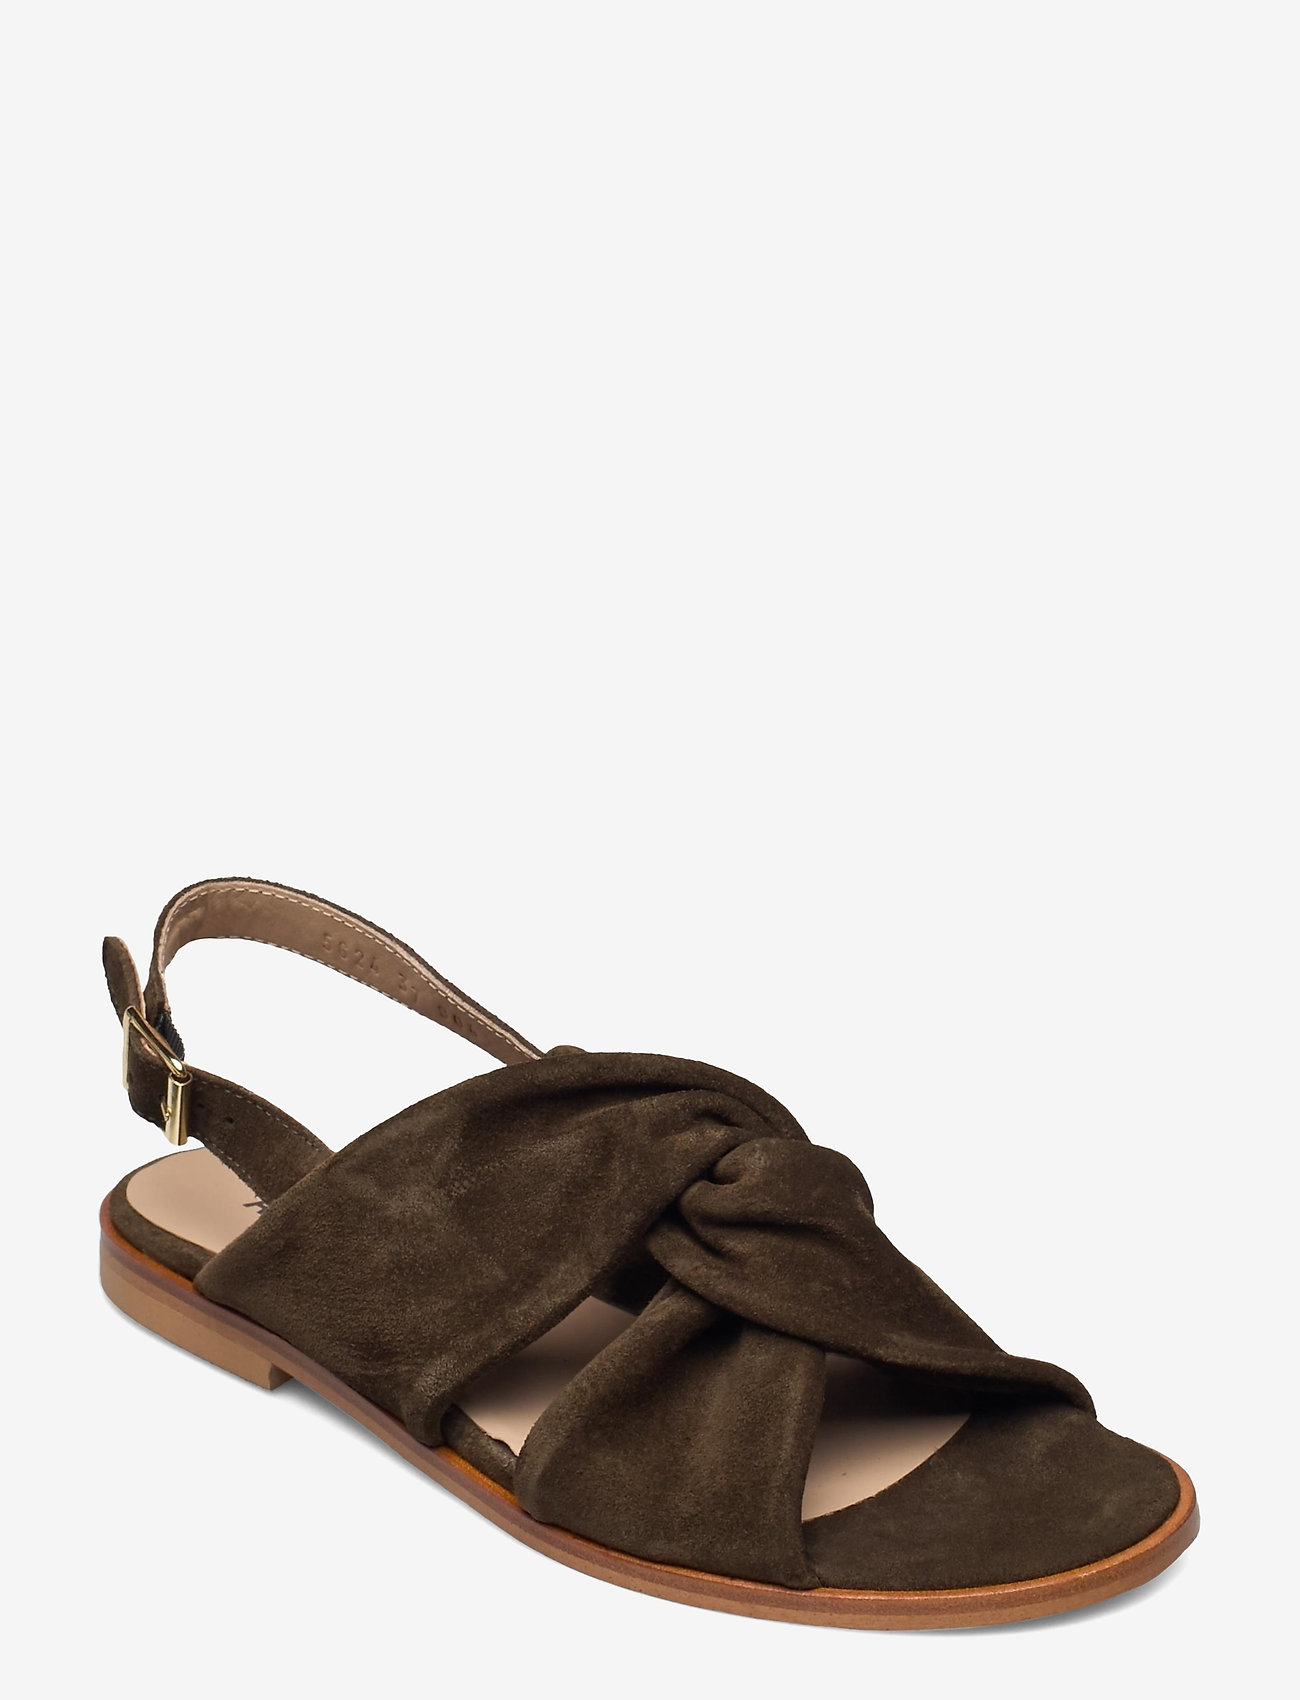 ANGULUS - Sandals - flat - open toe - op - flache sandalen - 2214 dark olive - 0